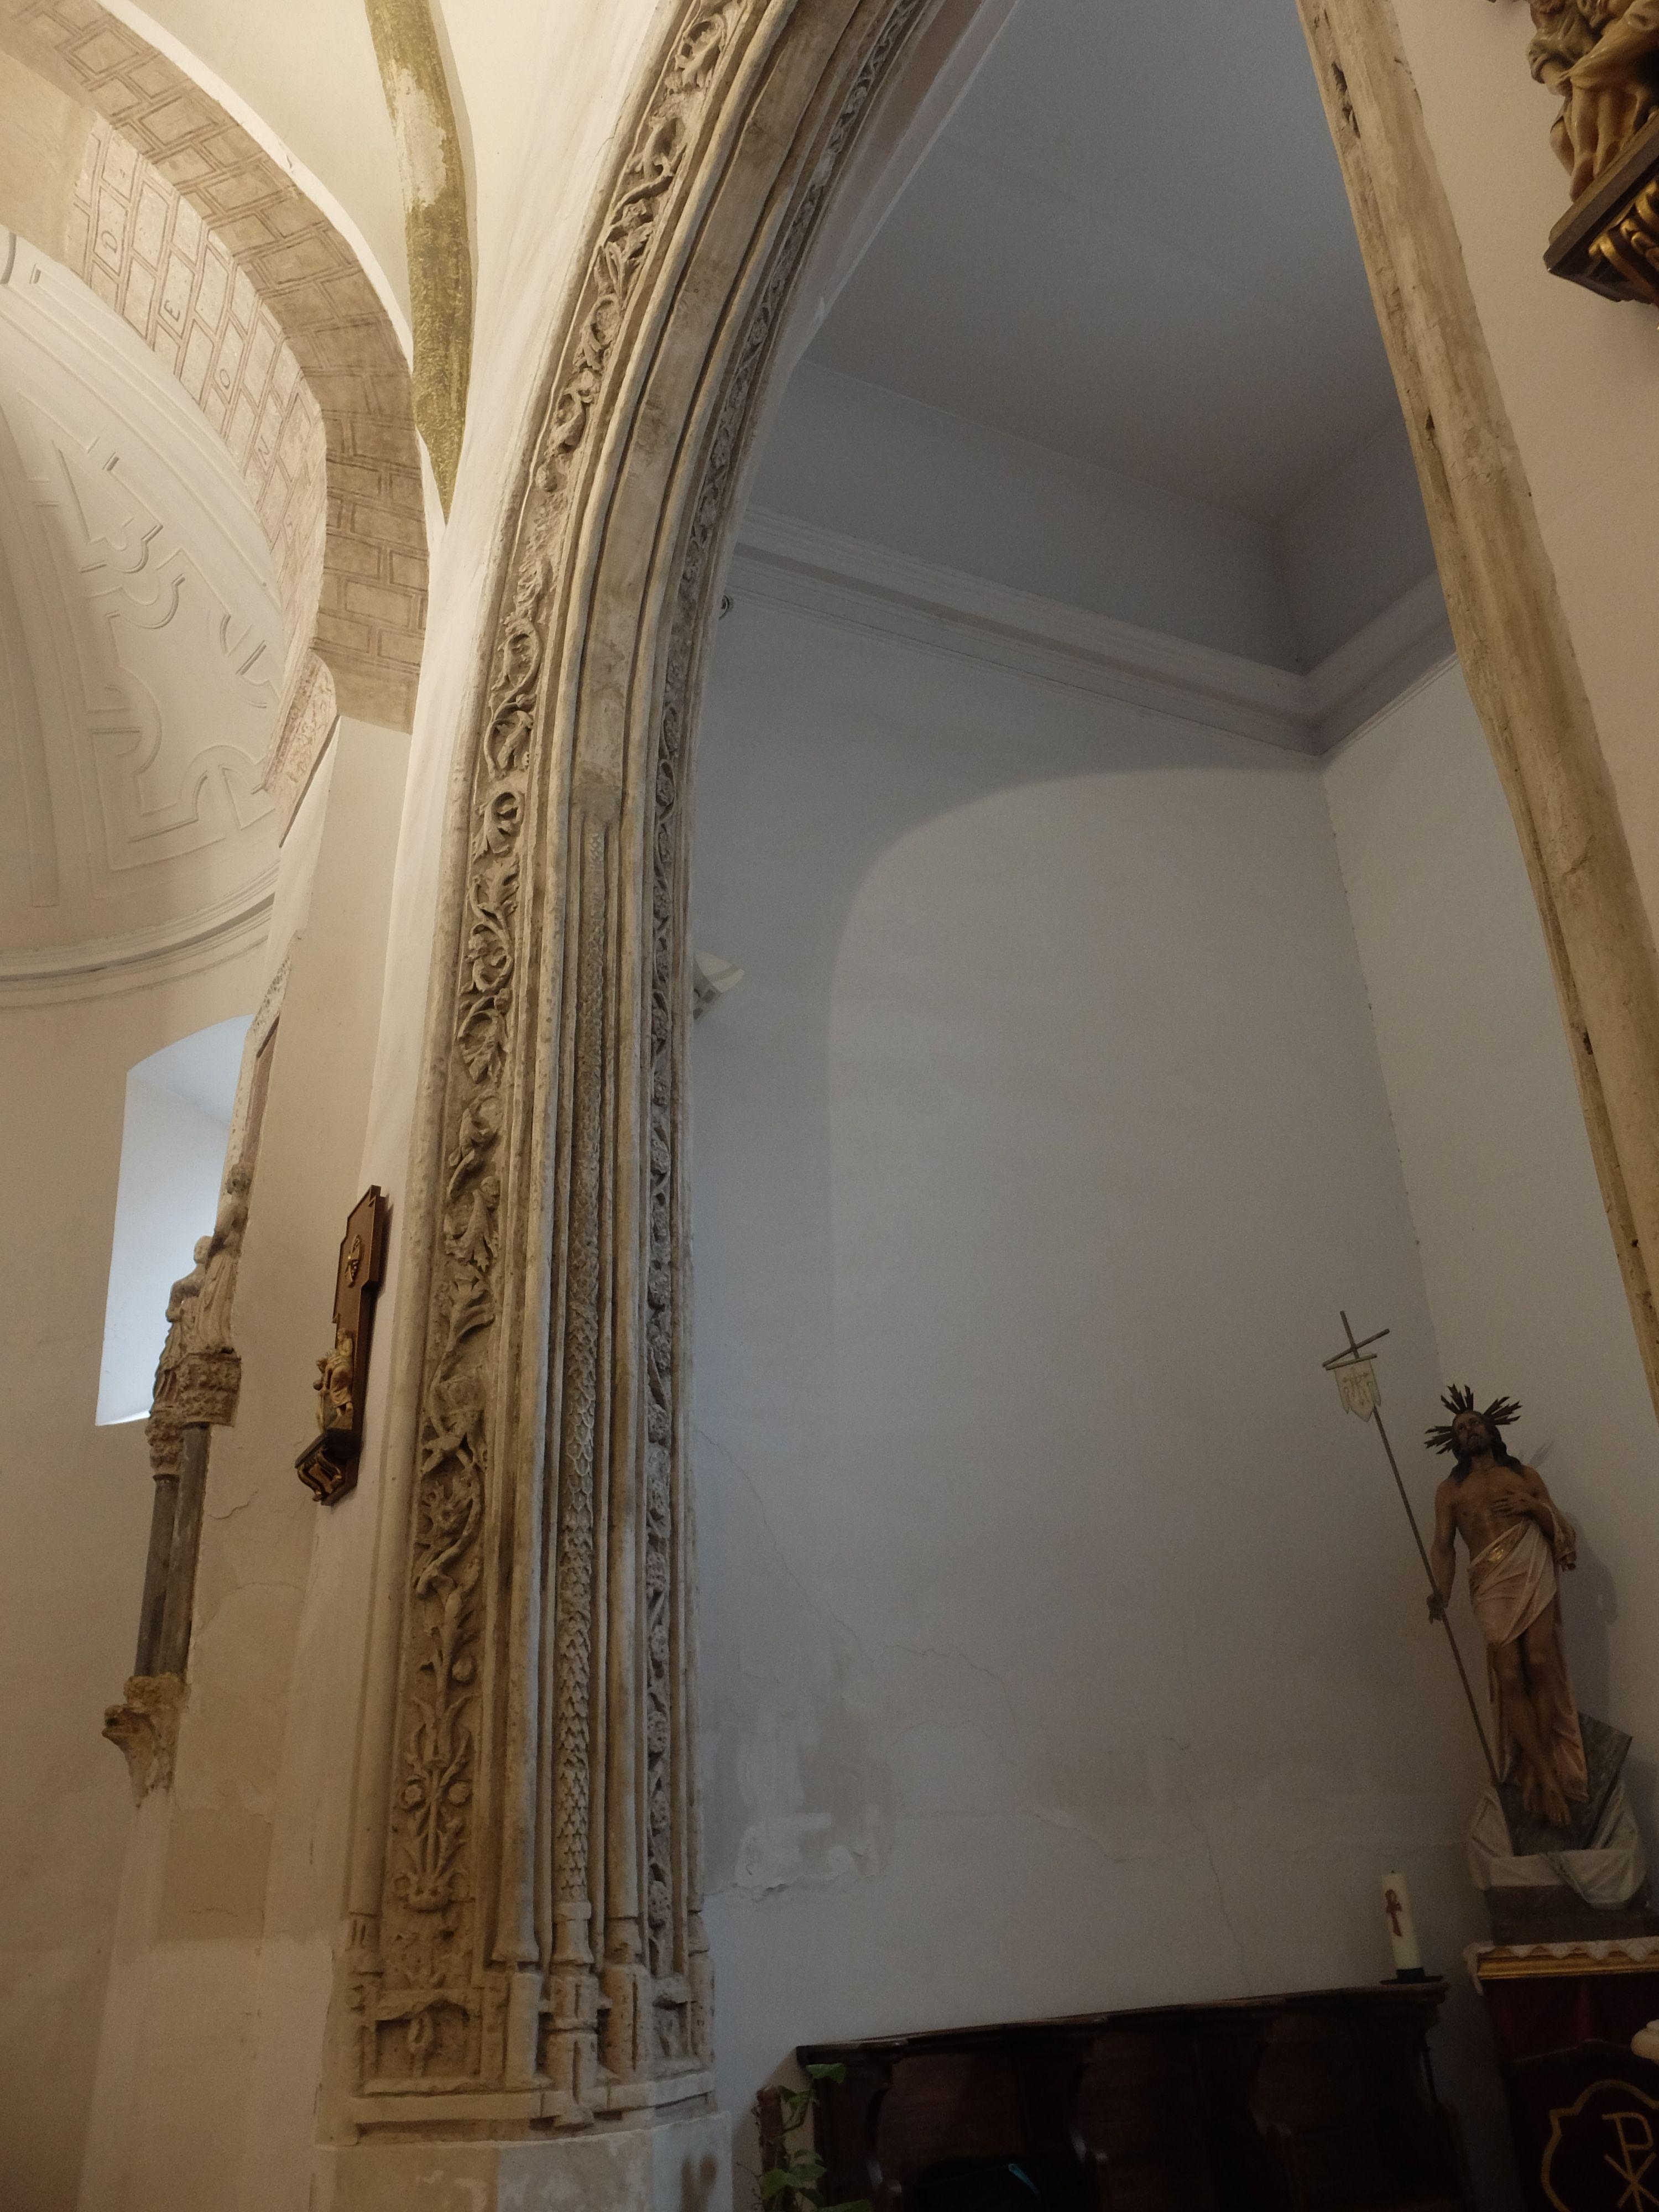 Arco plateresco de entrada a la Capilla del Cristo de la Misericordia o del Rosario.